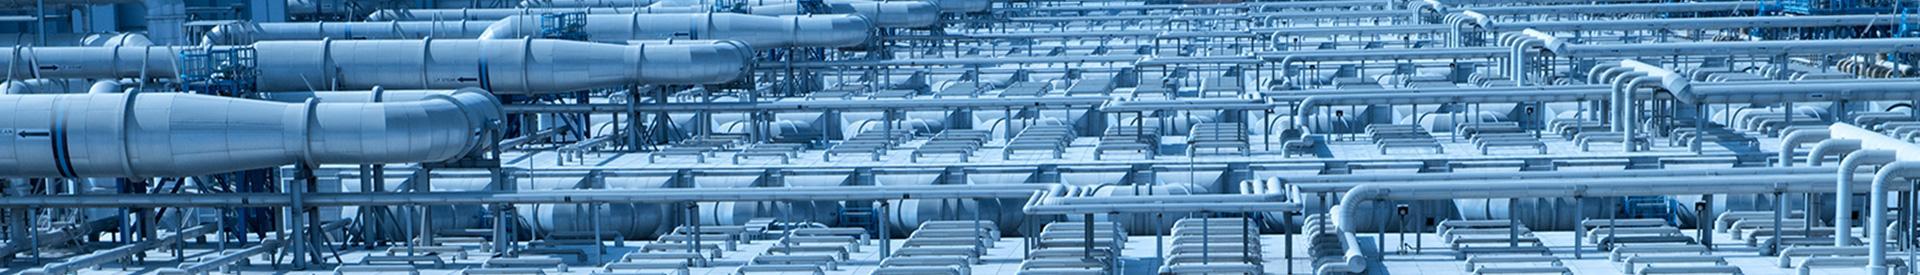 Water Desalination - Fisia Italimpianti